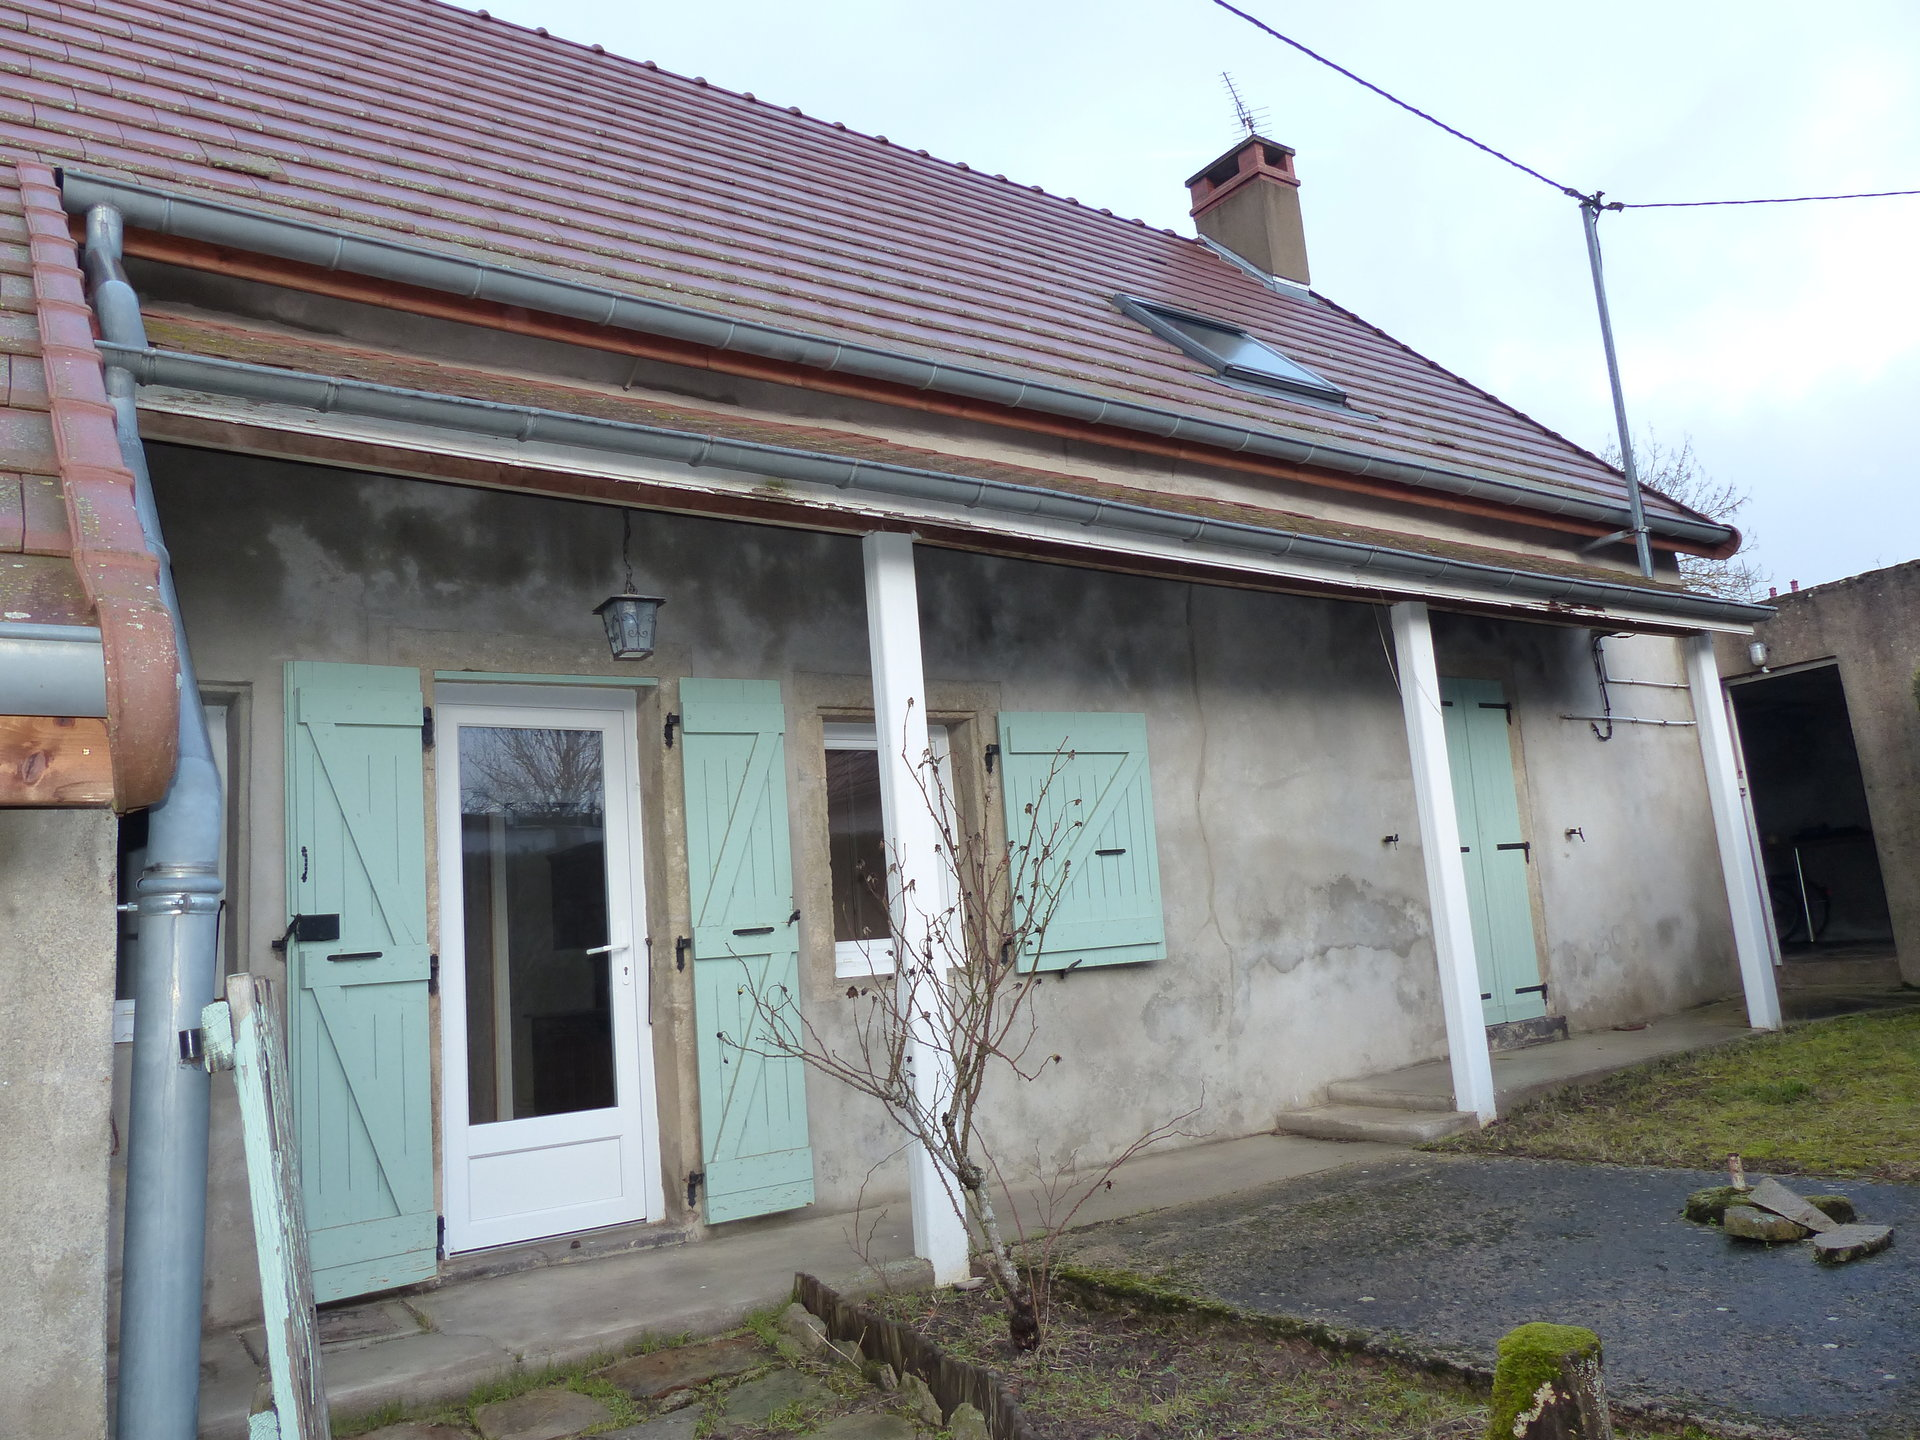 AXE LE CREUSOT-AUTUN - Maison d'habitation